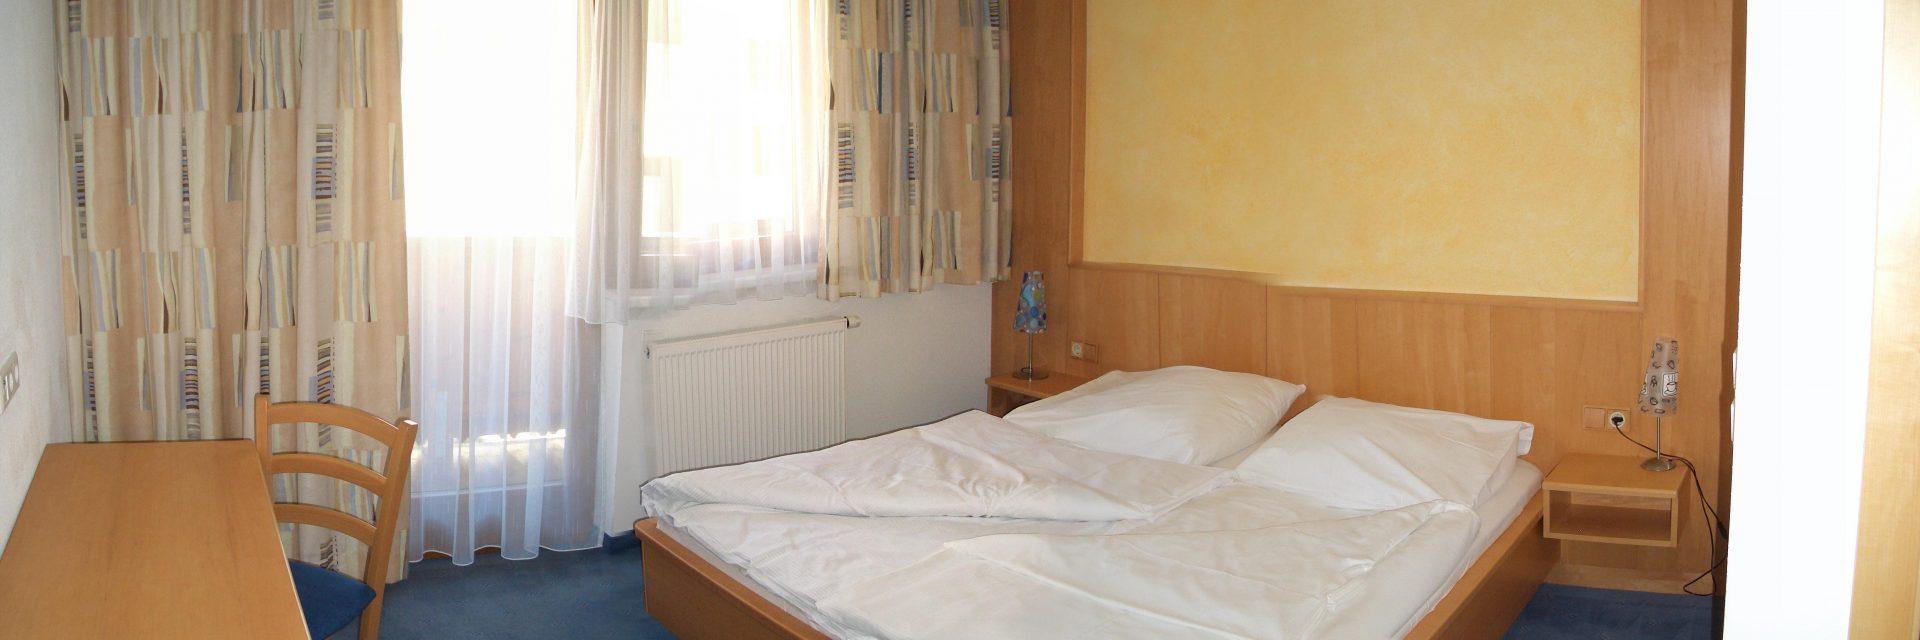 Apartements Hirner